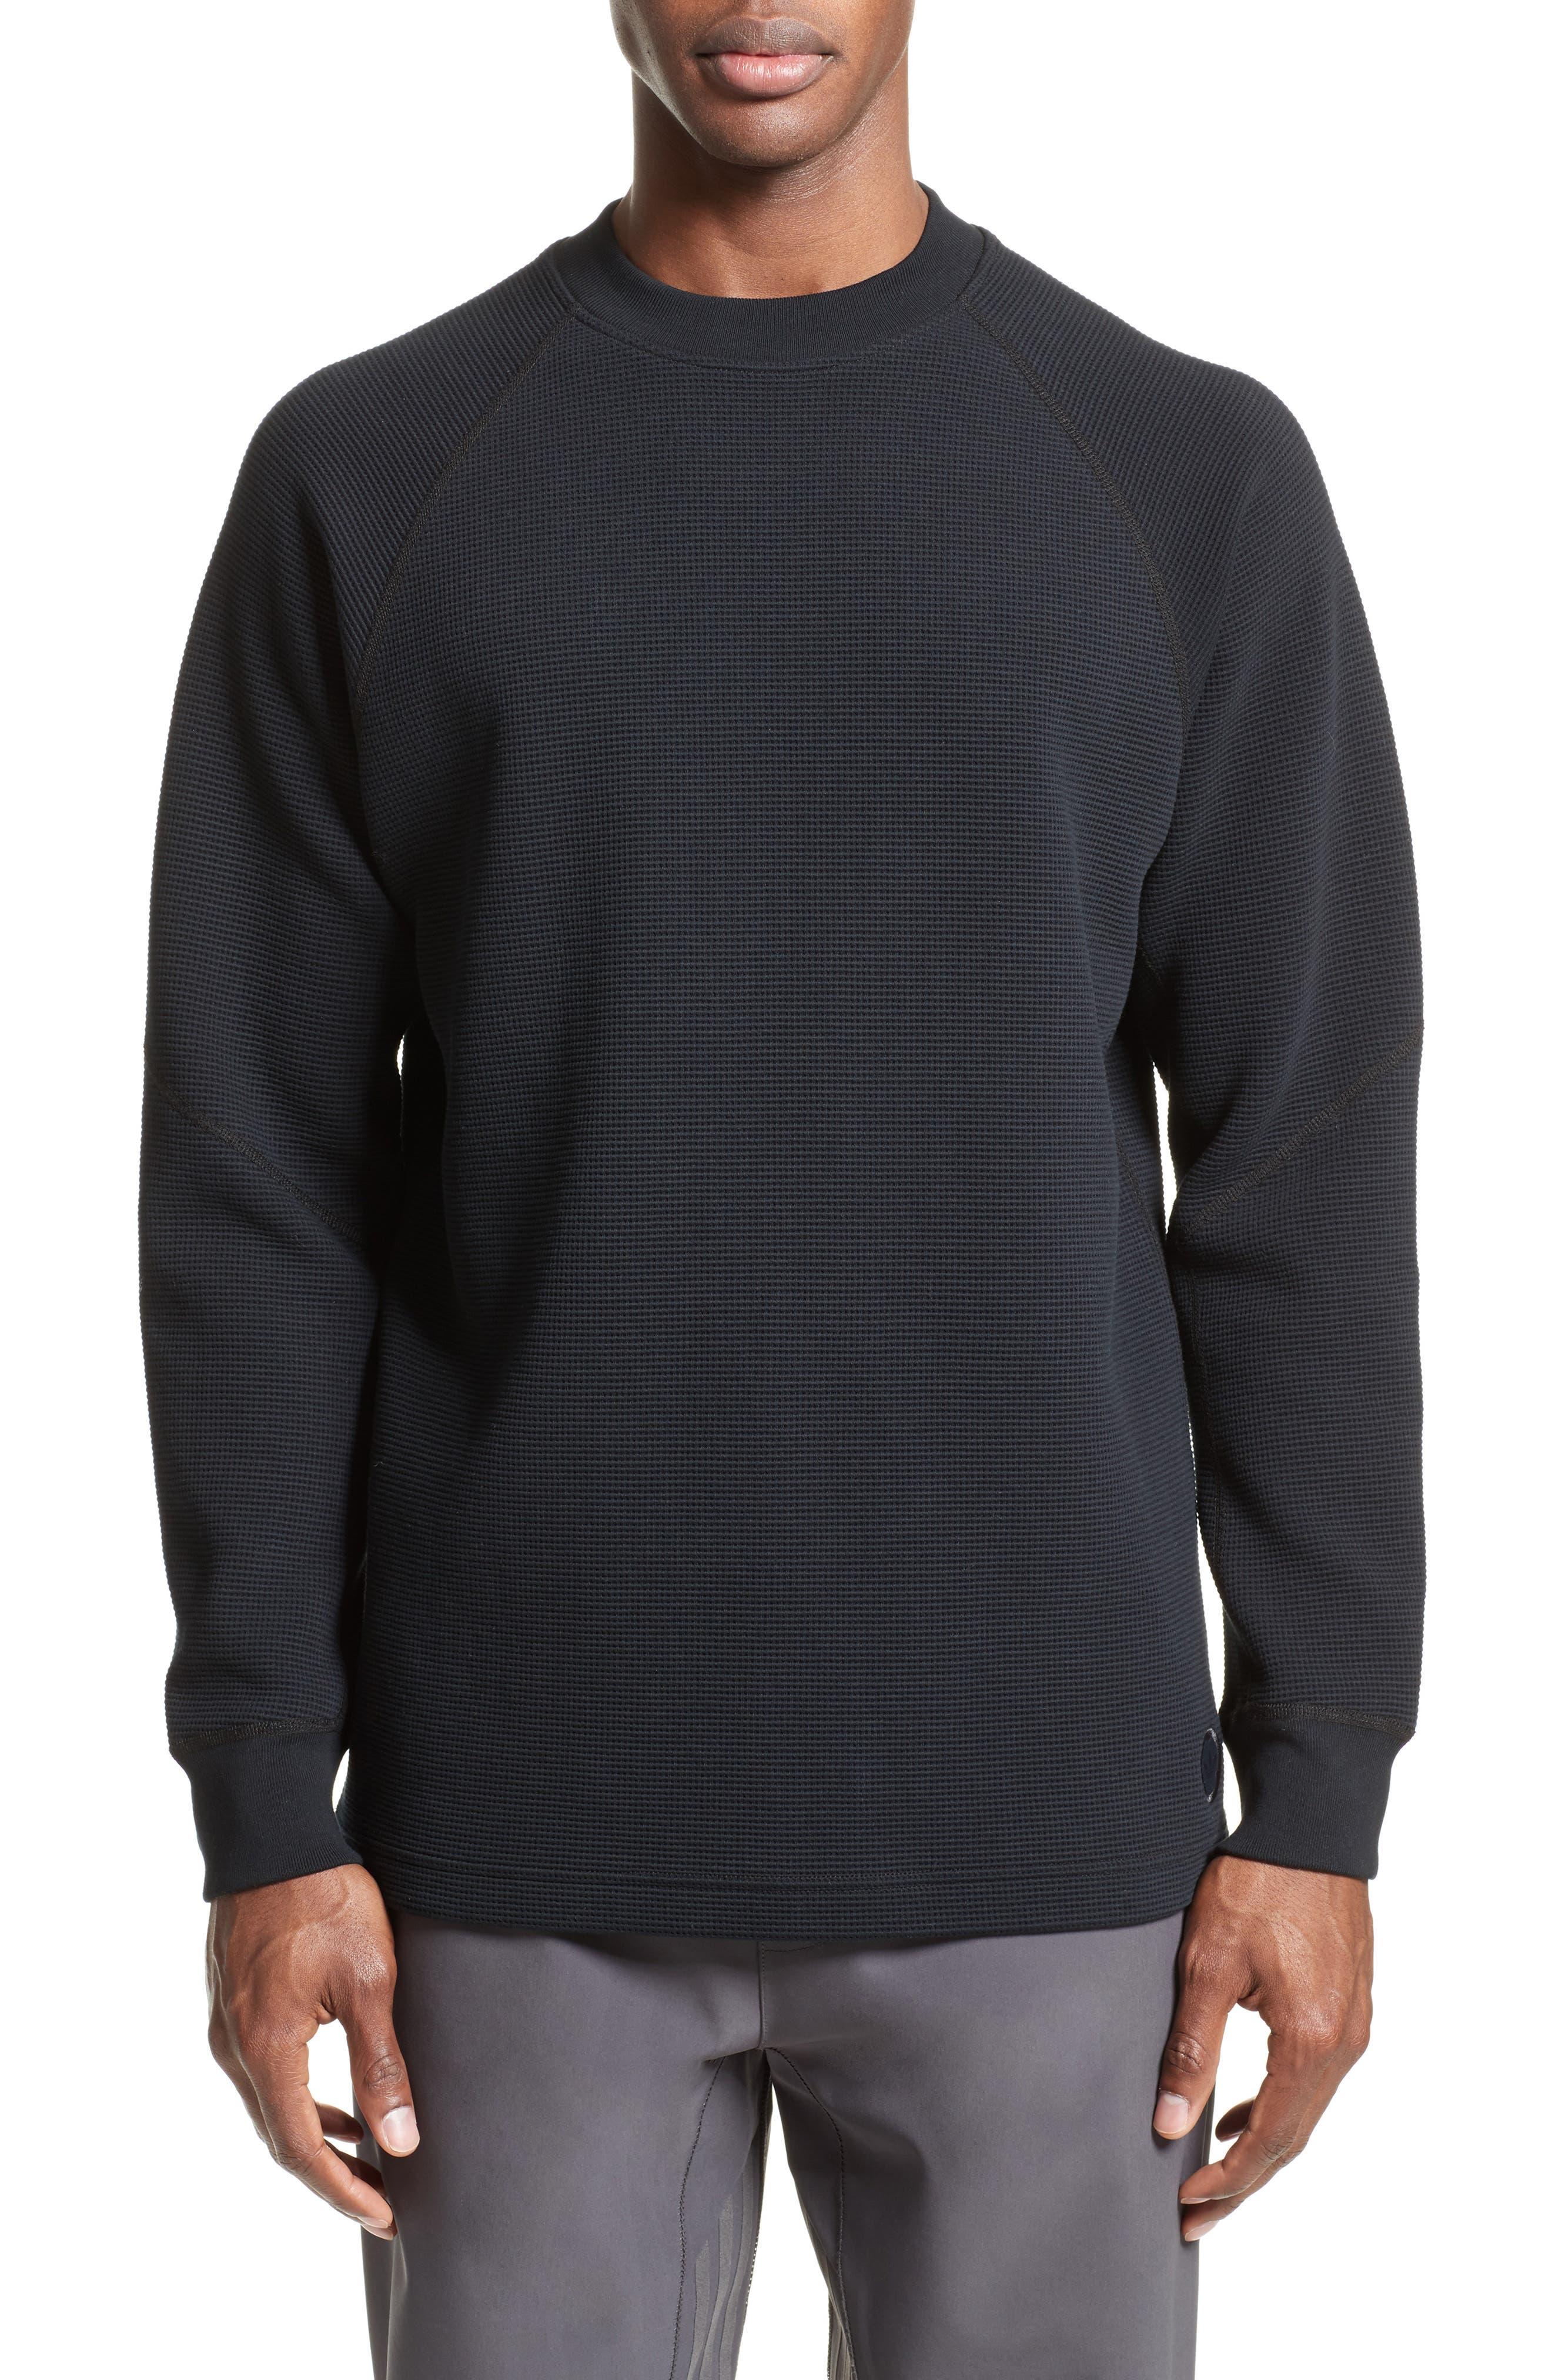 Main Image - wings + horns x adidas Fisherman Crewneck Sweatshirt